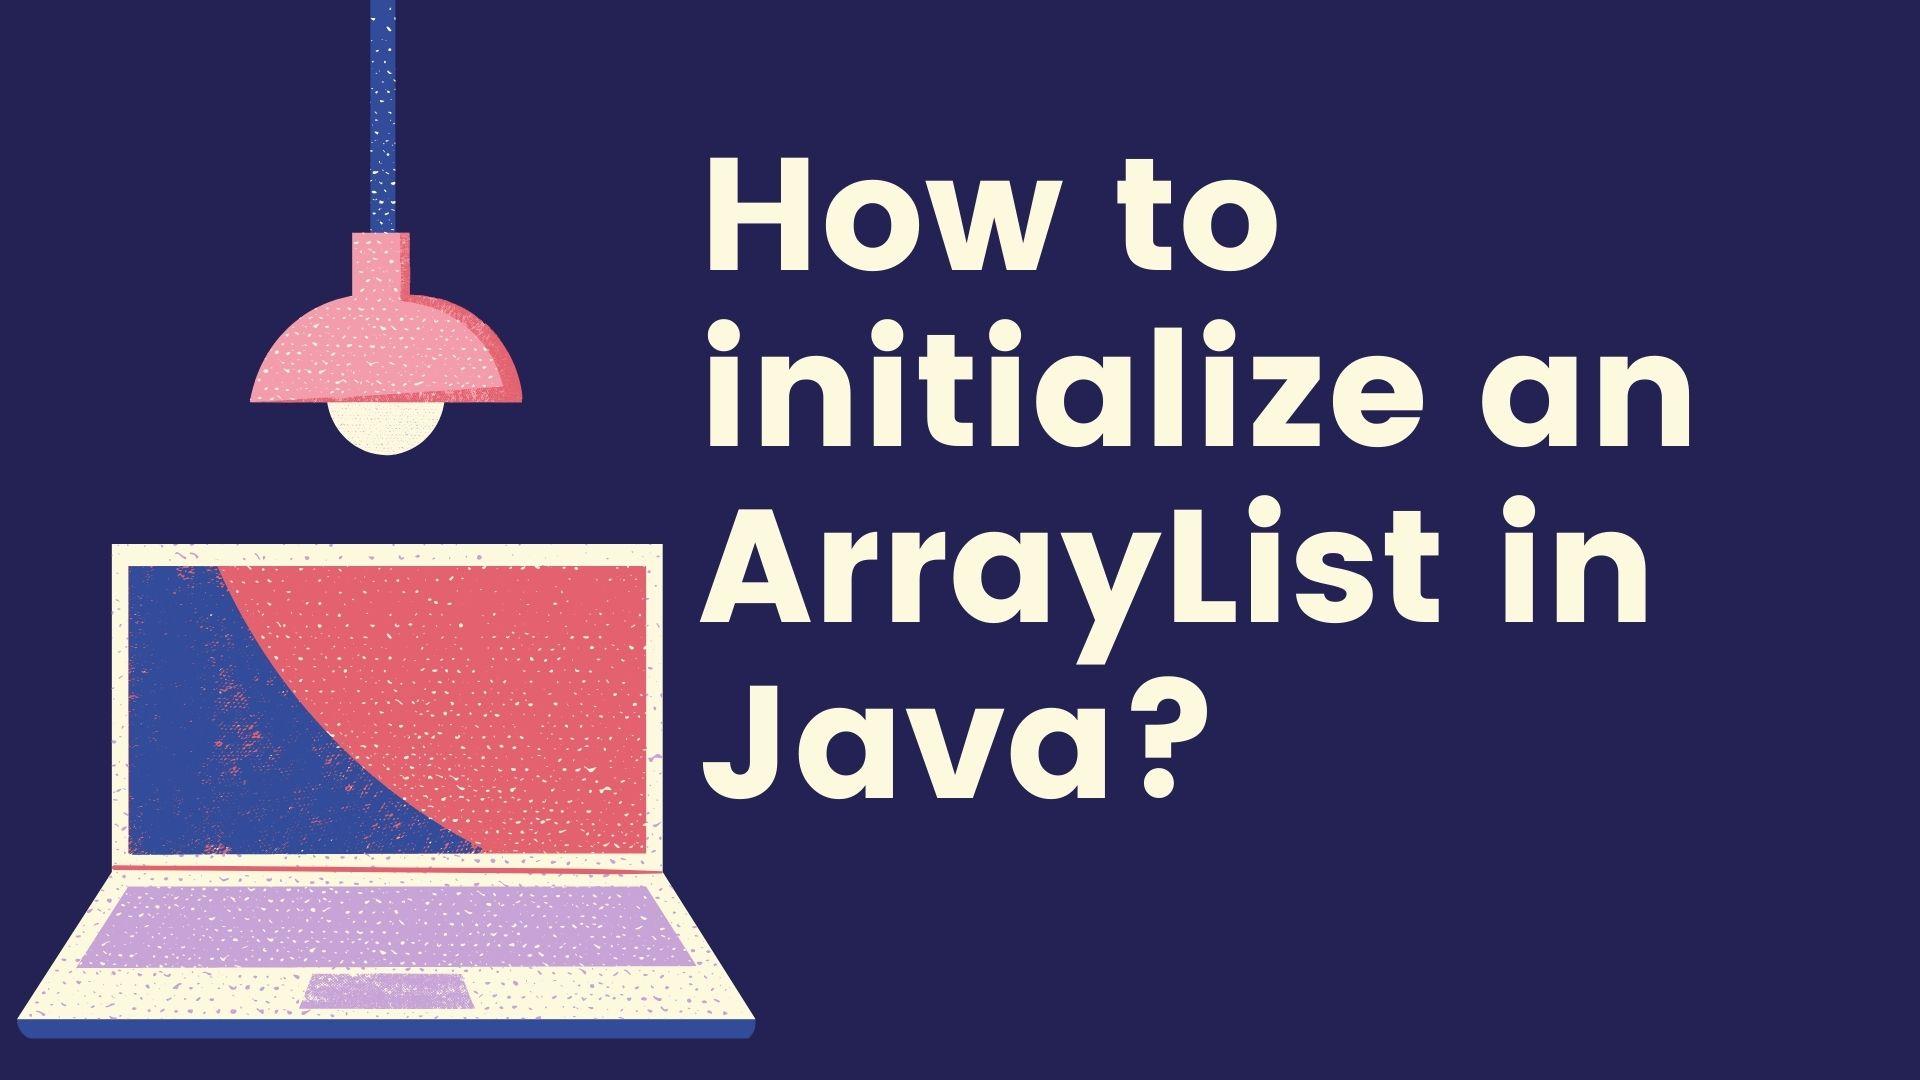 ArrayList in Java